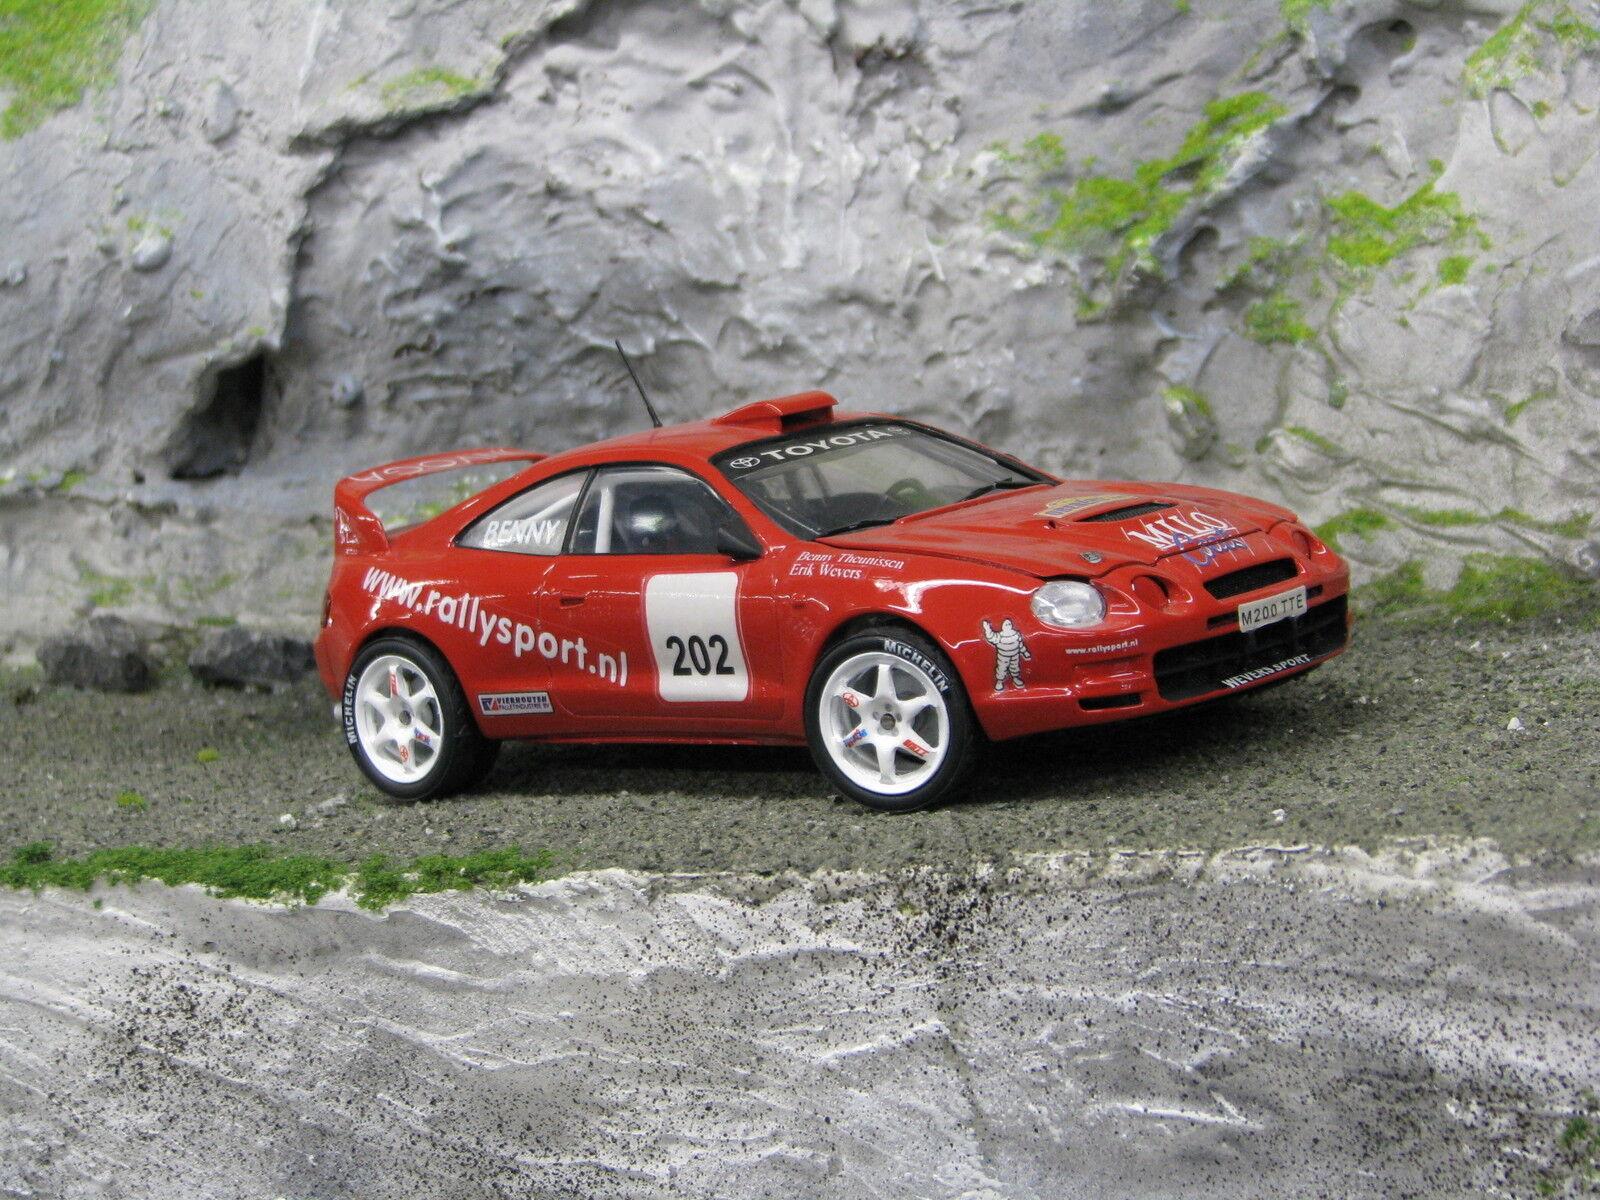 QSP Toyota Celica GT-Four 1995 1:24  202 Wevers / Theunissen ADAC Rallye Oberehe